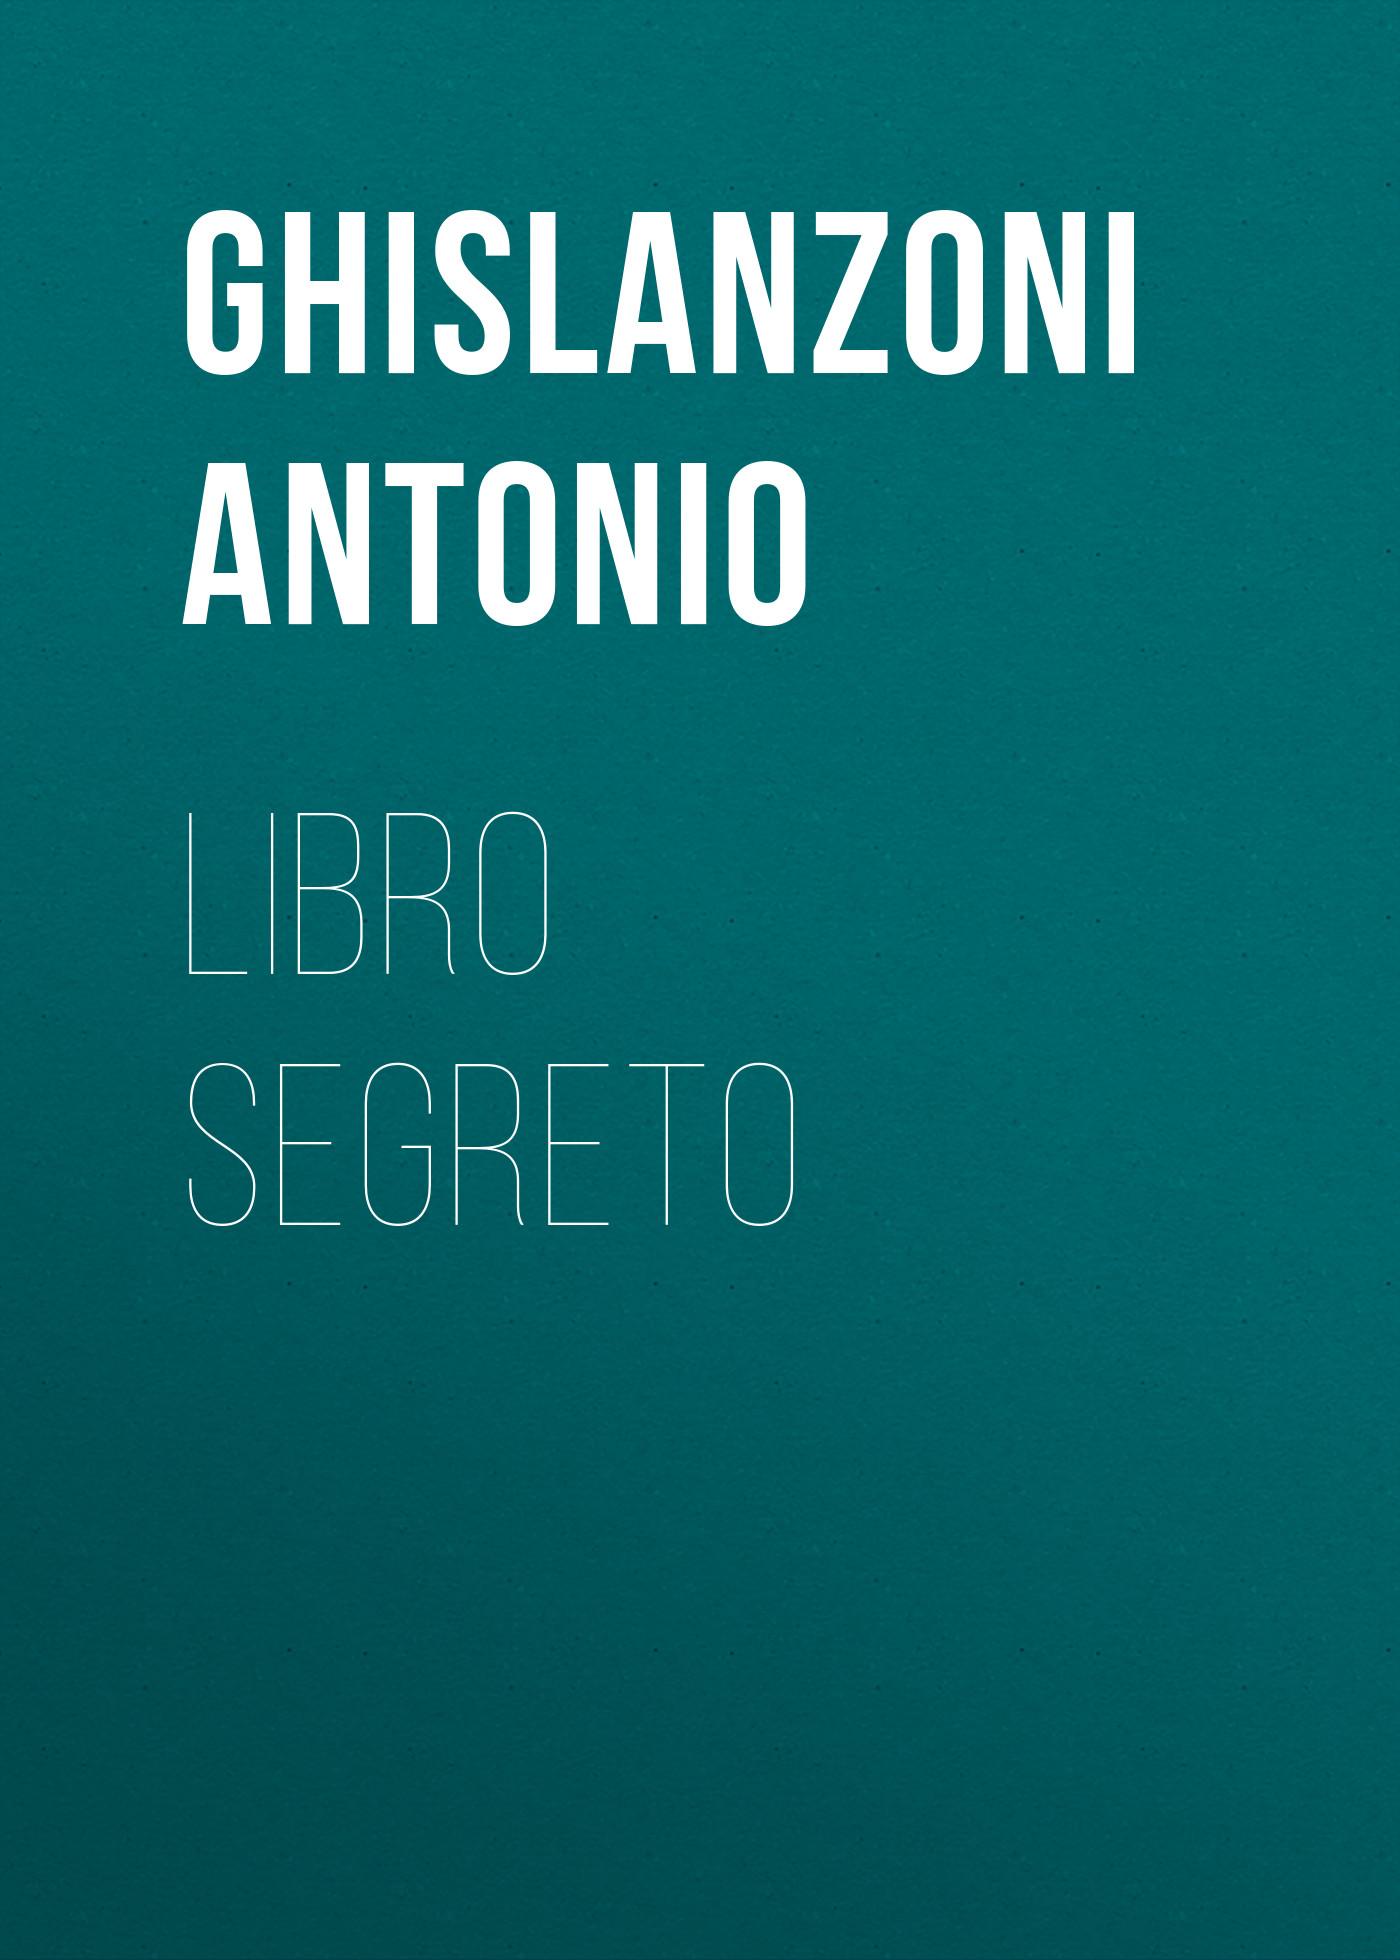 Ghislanzoni Antonio Libro segreto rst 02309 iq309